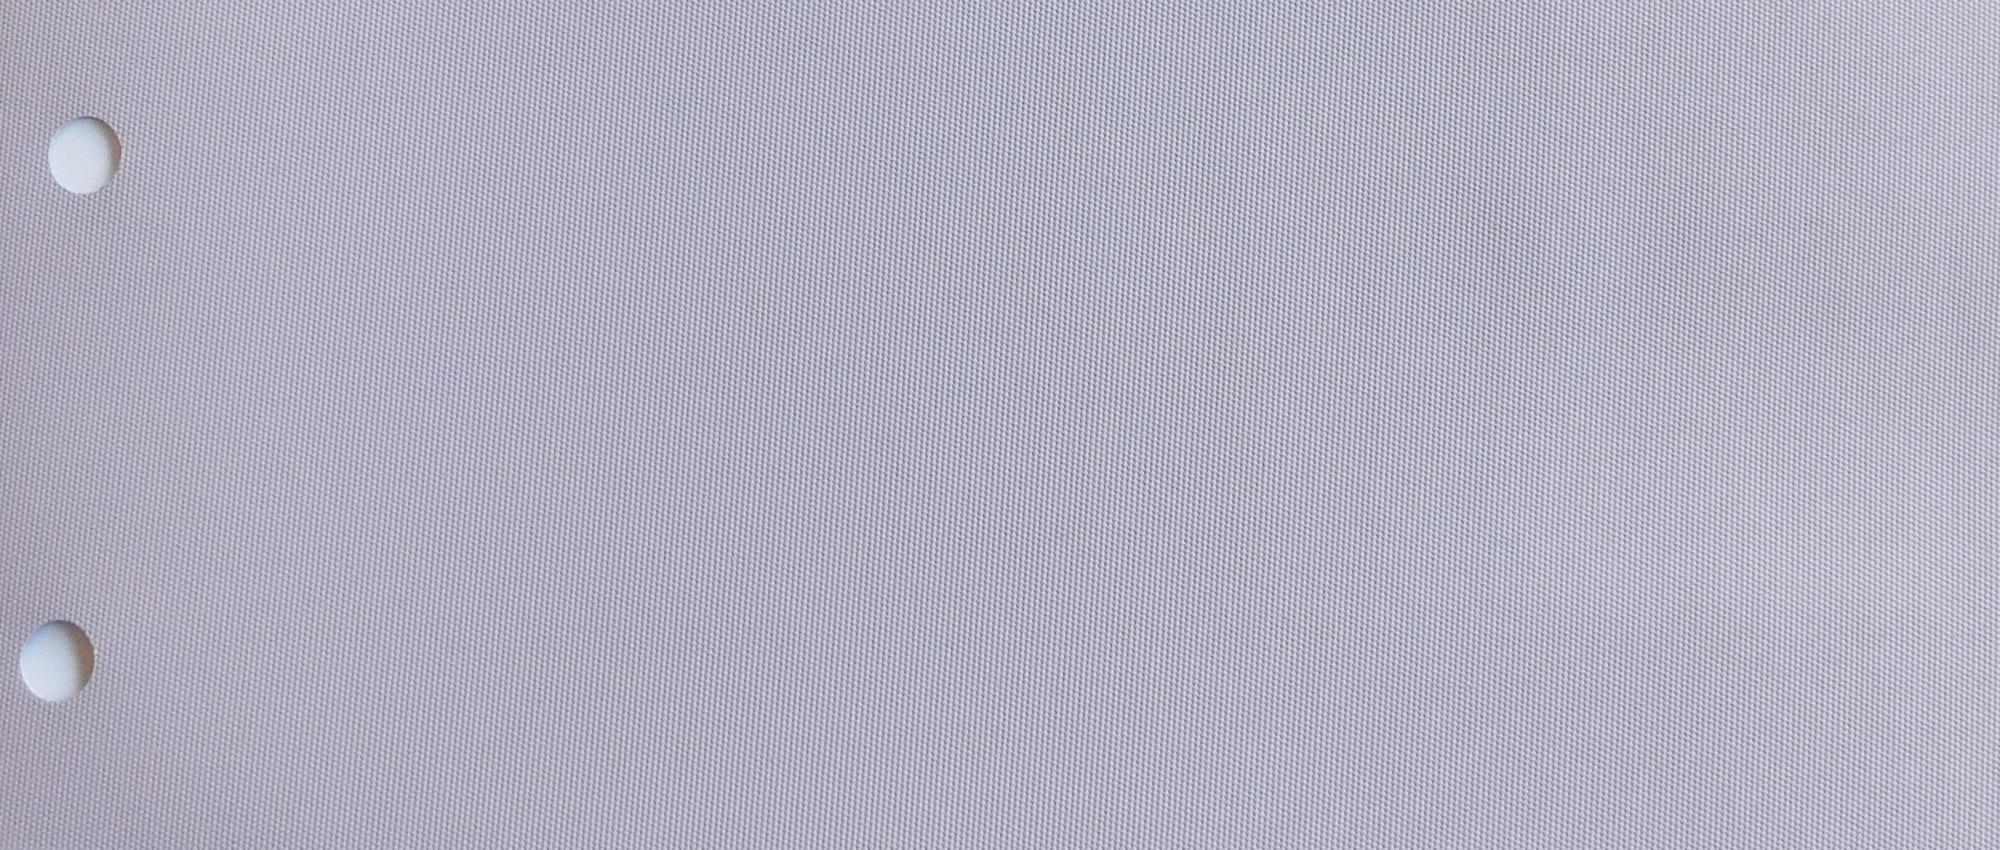 Vitra Violet blind fabric